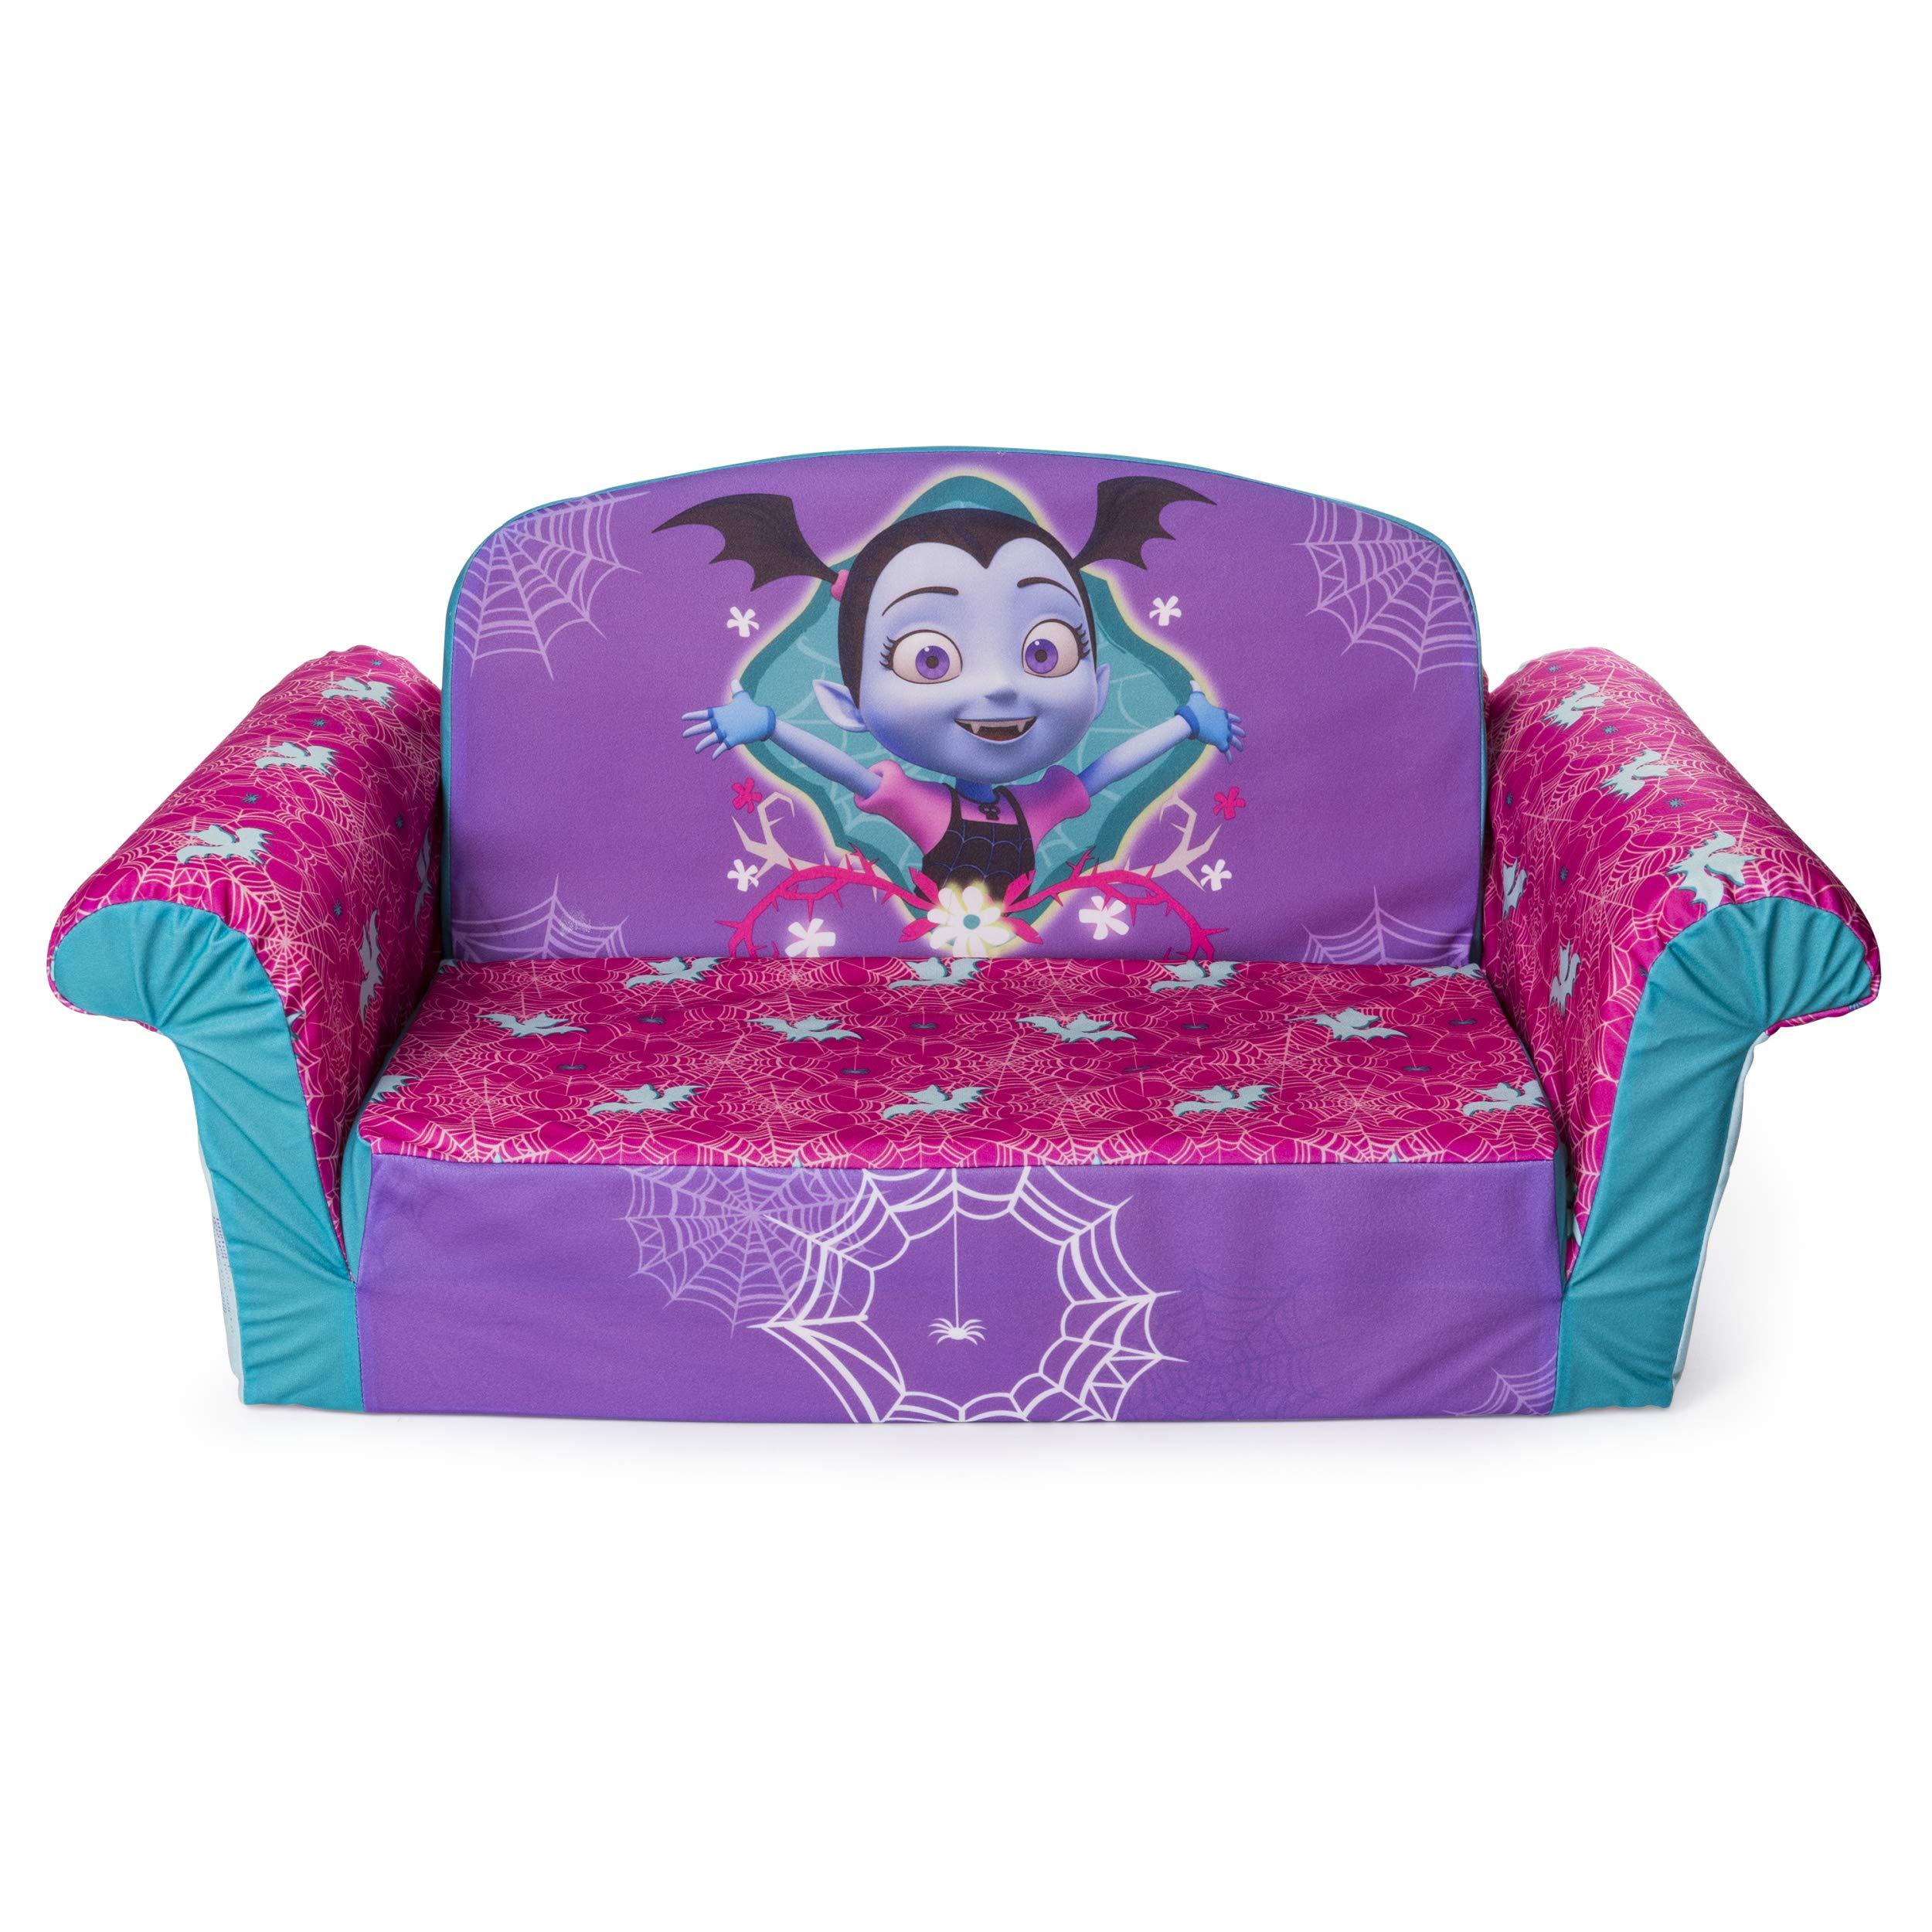 Marshmallow Furniture, Children's 2 in 1 Flip Open Foam Sofa, Disney's Vampirina, by Spin Master by Marshmallow Furniture